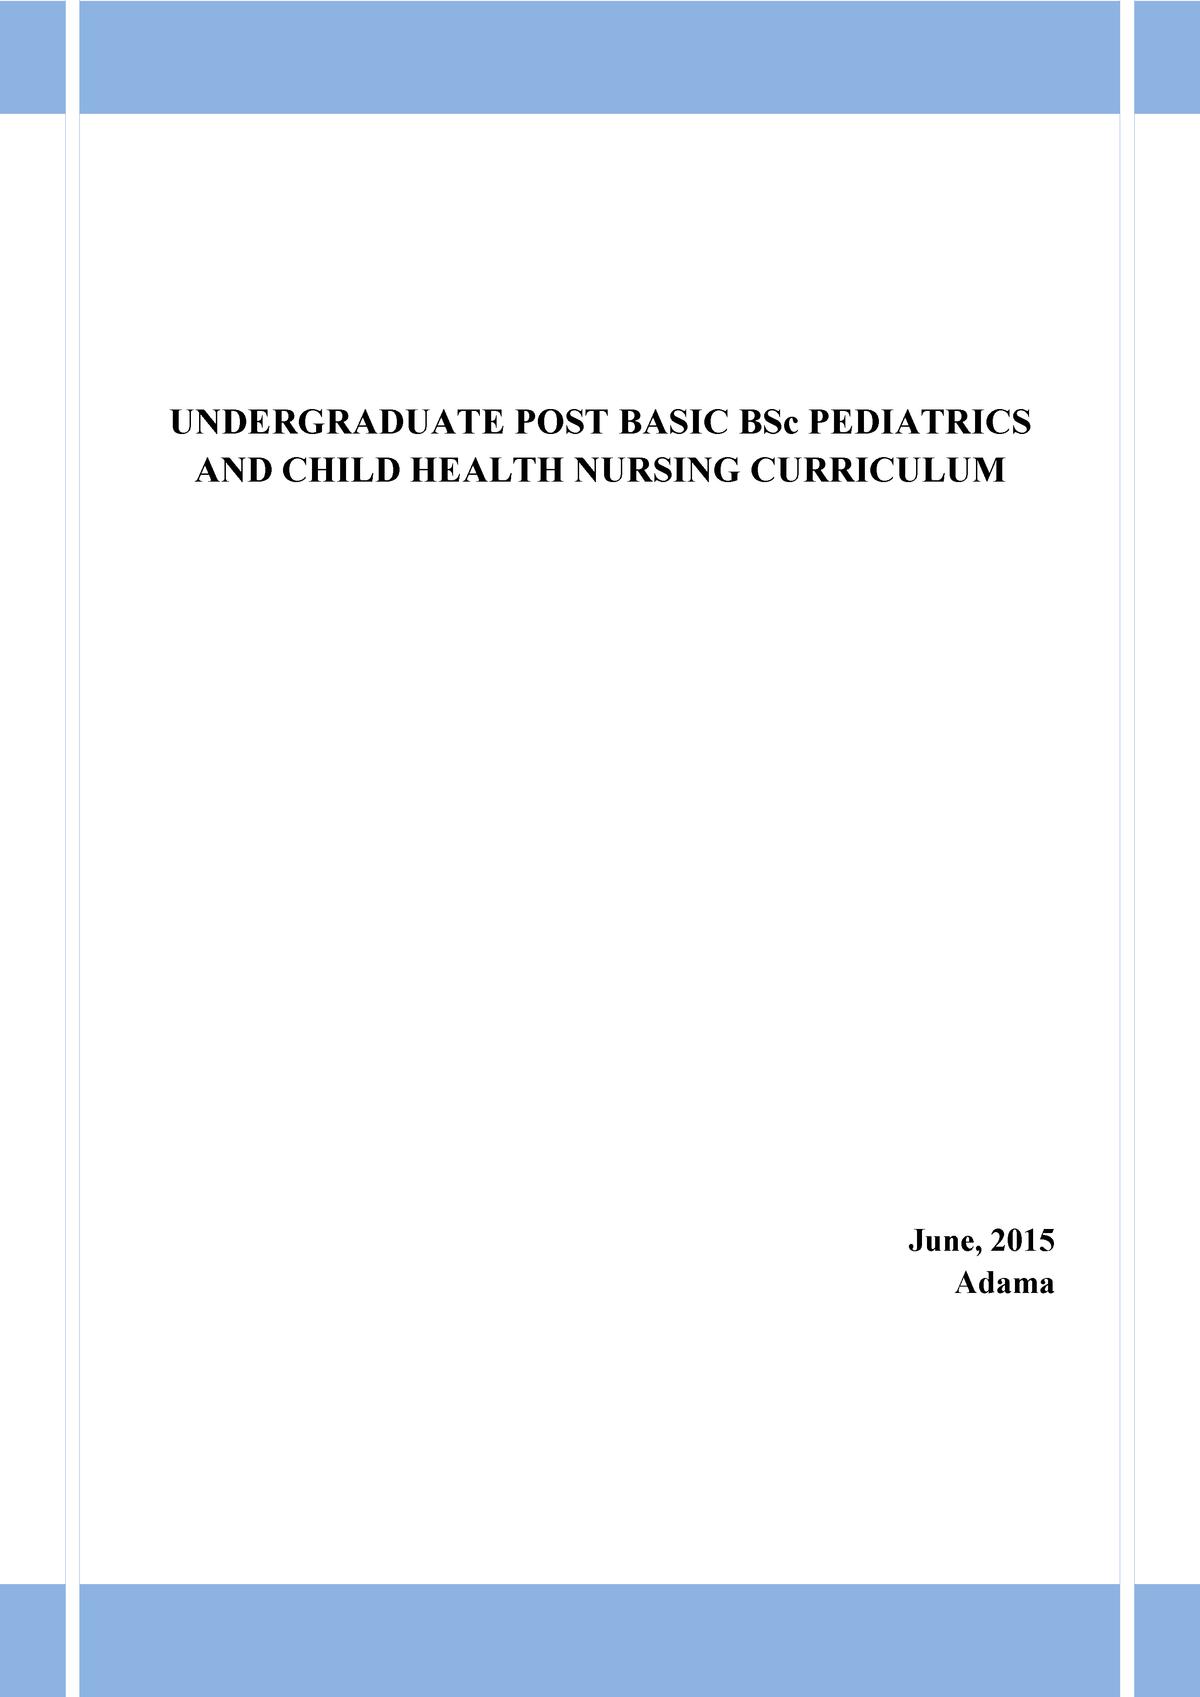 Pediatrics and Child He alth Nursing Curriculum - He: Health